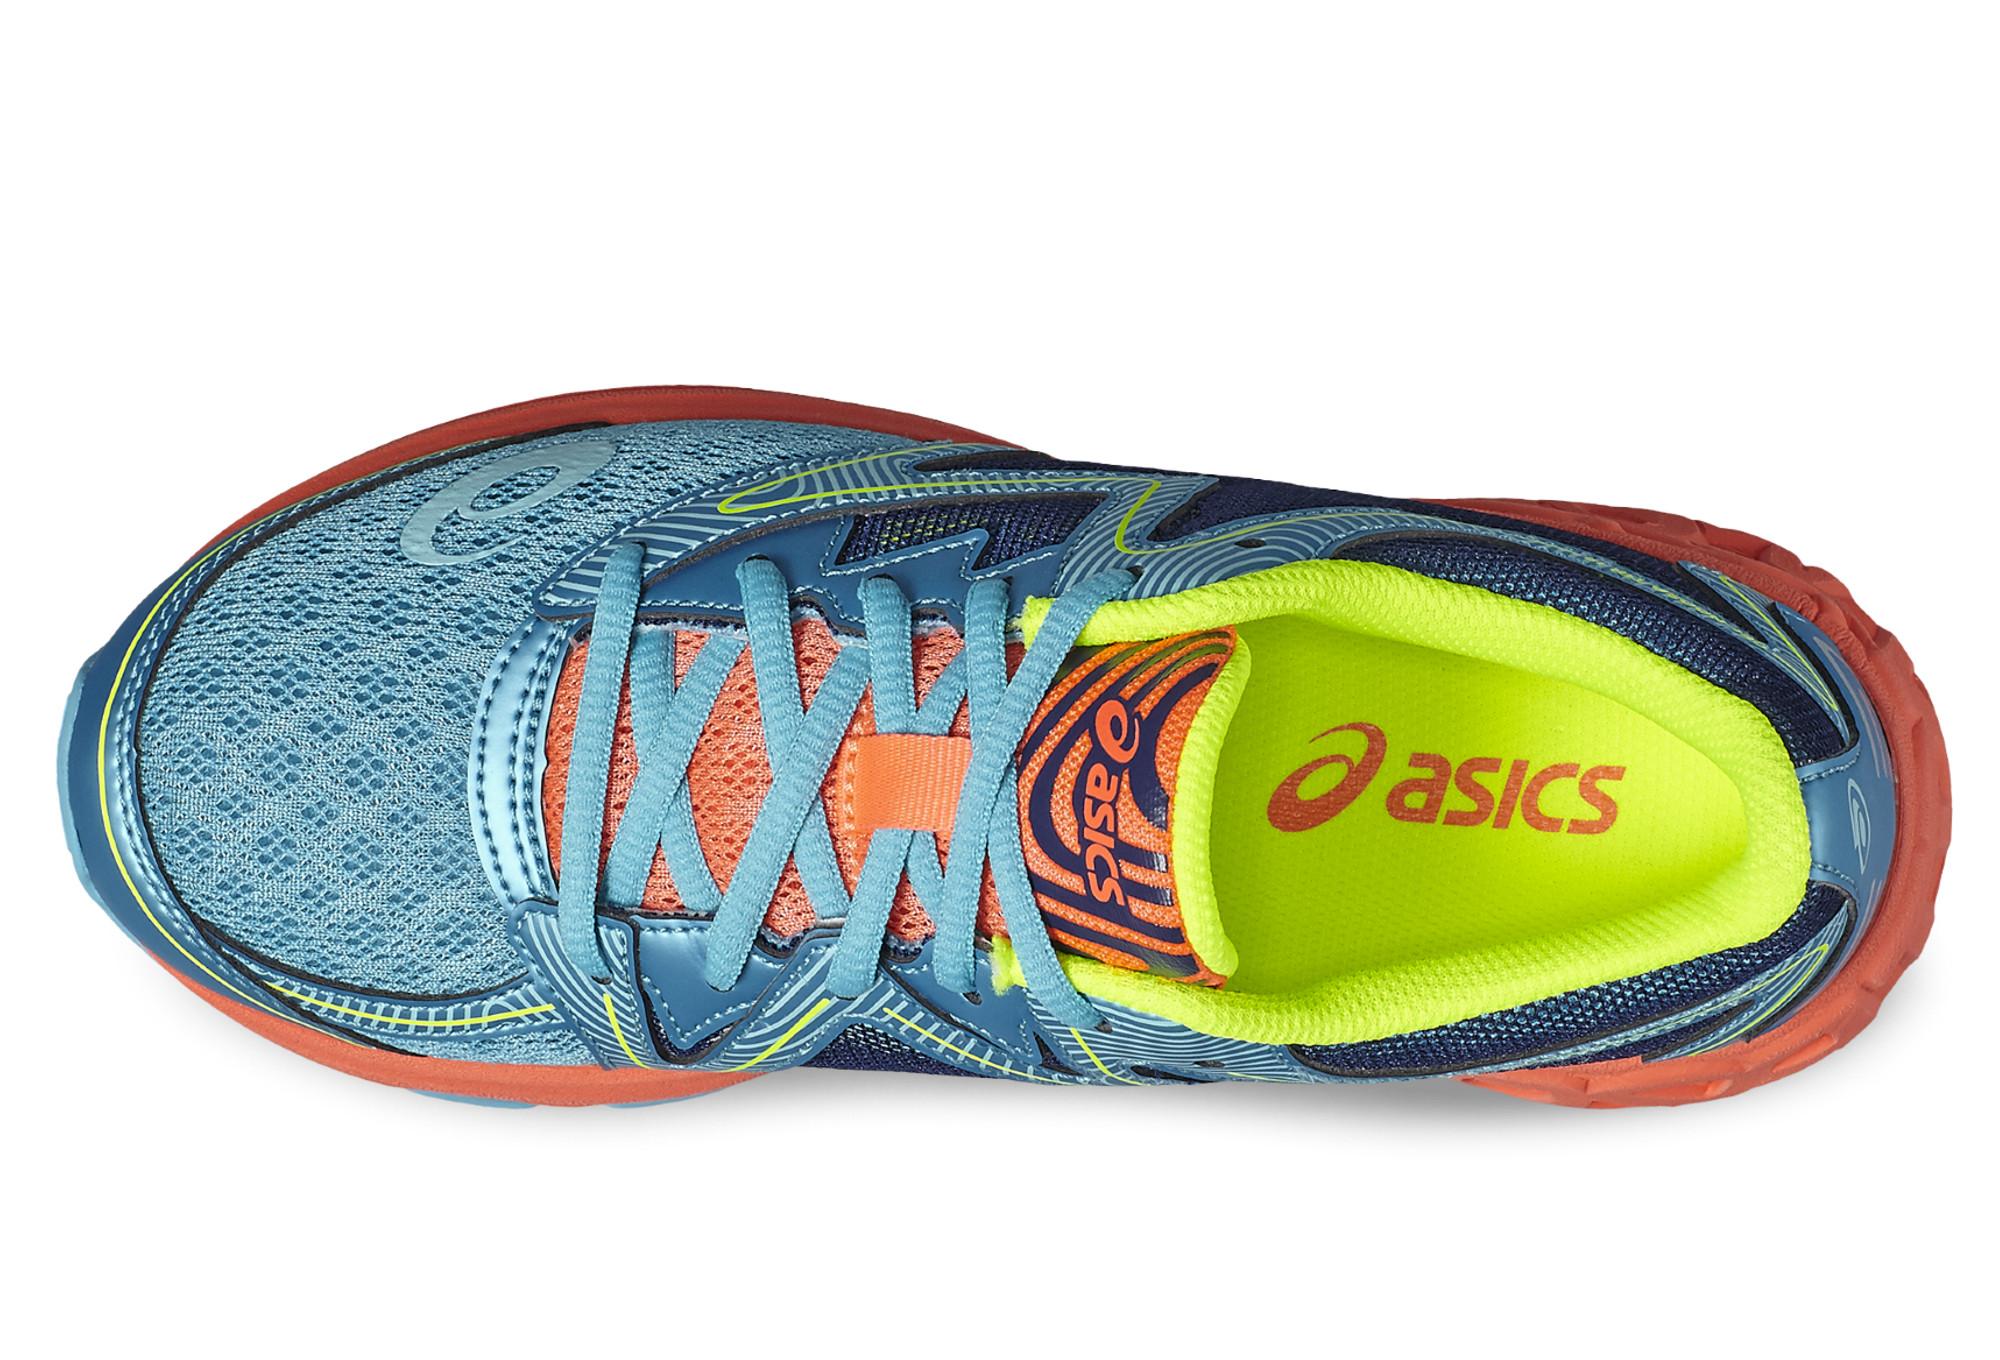 Asics Noosa GS Azul Naranja Amarillo